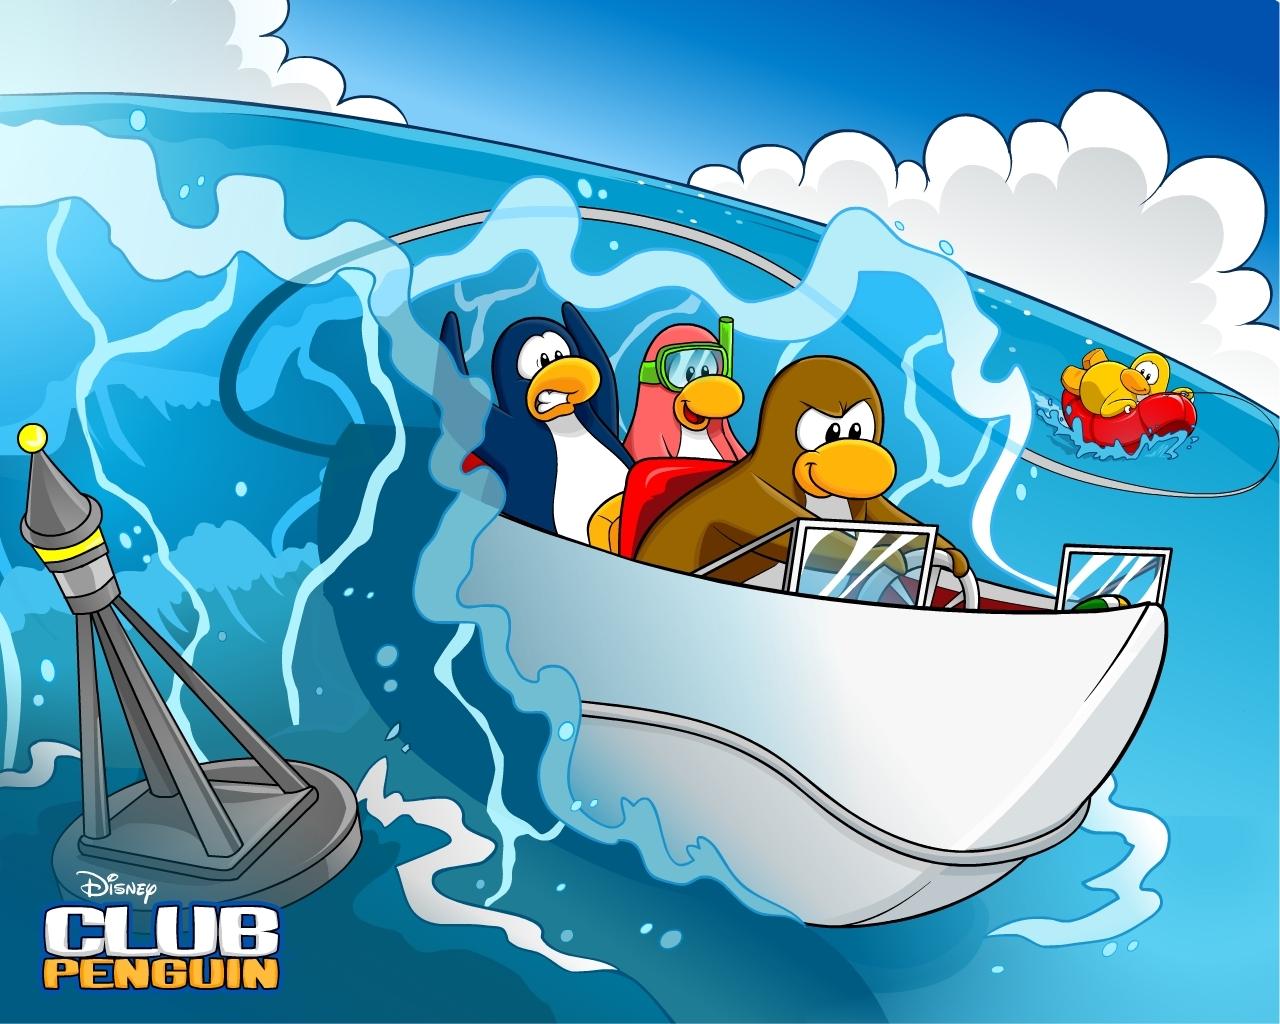 New Hydro Hopper CP Wallpaper Club Penguin Super Guide 1280x1024